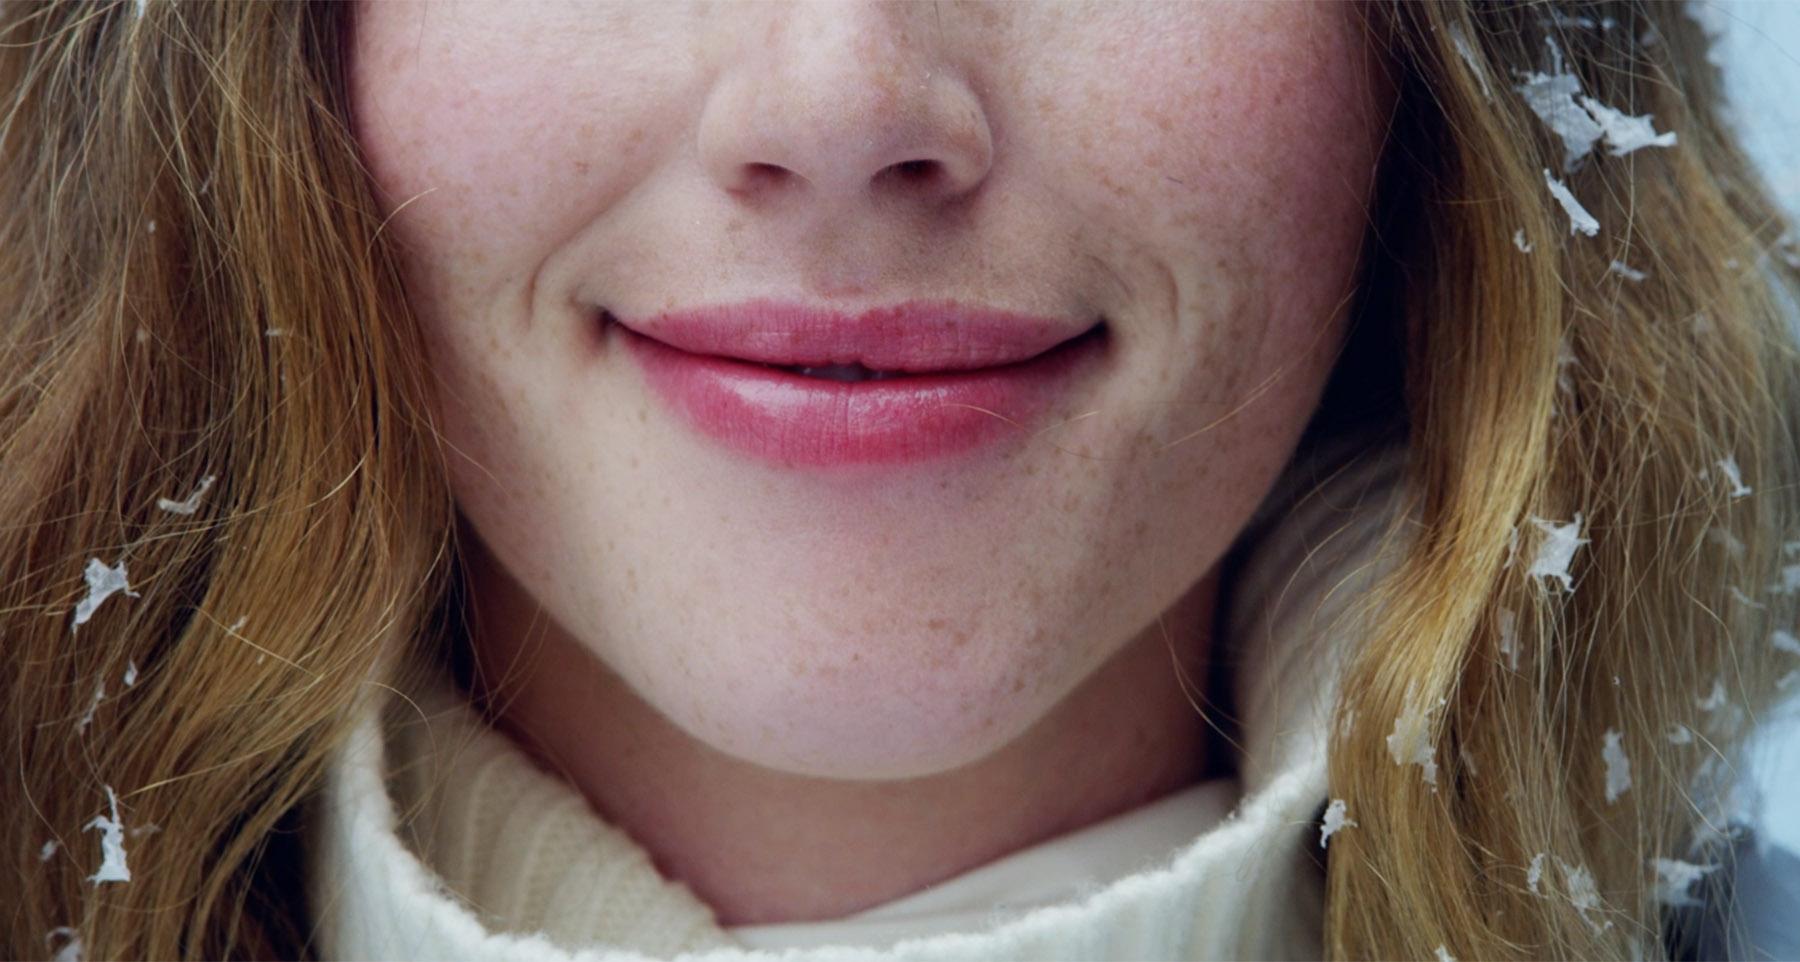 EverydayMiracle_Lips_Header.jpg